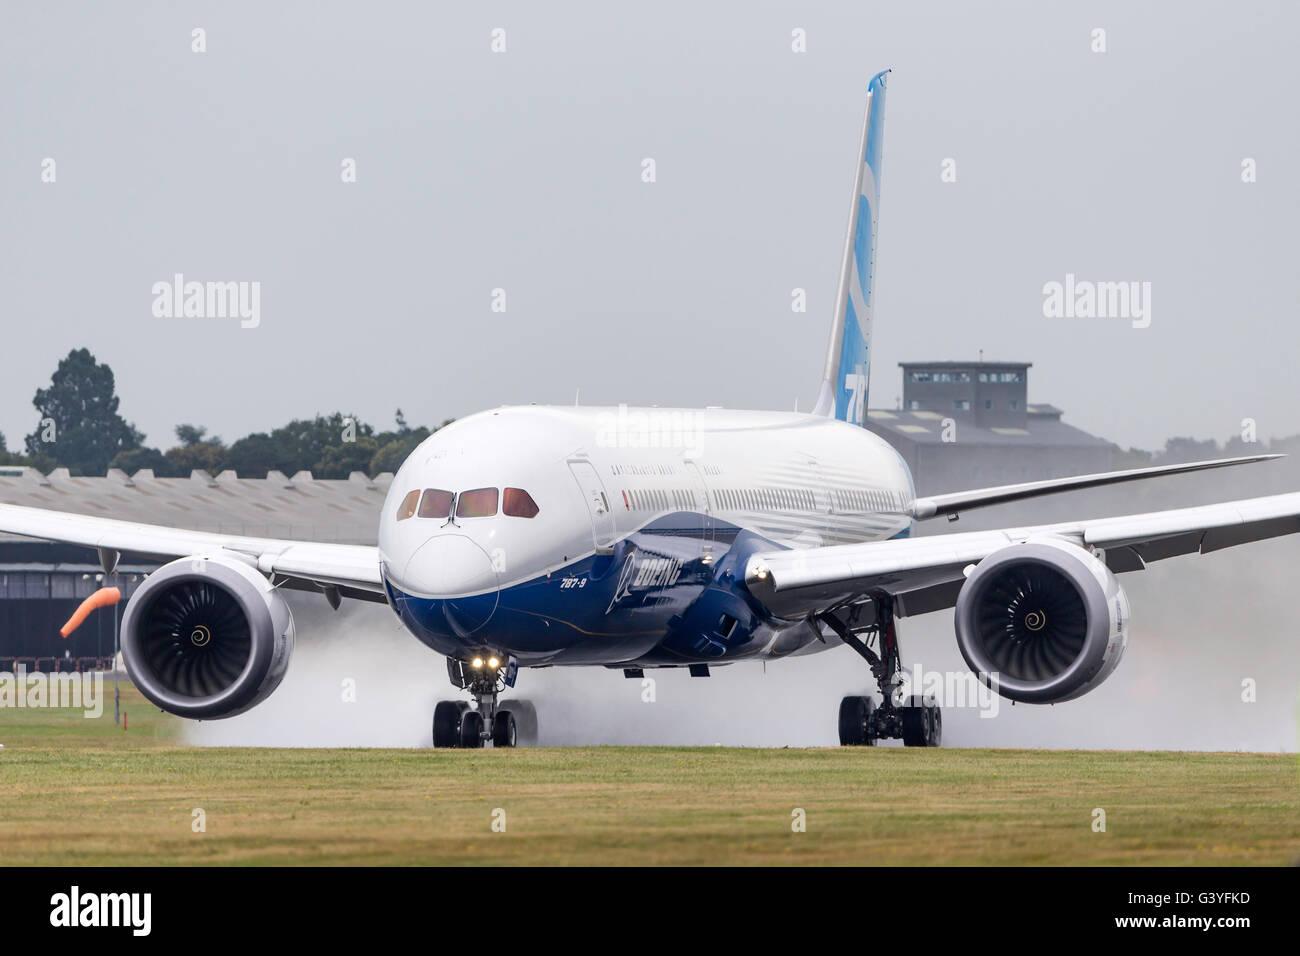 Boeing 787 9 dreamliner stock photos boeing 787 9 dreamliner stock boeing 787 9 dreamliner commercial airline aircraft n789ex displaying at the farnborough international publicscrutiny Images